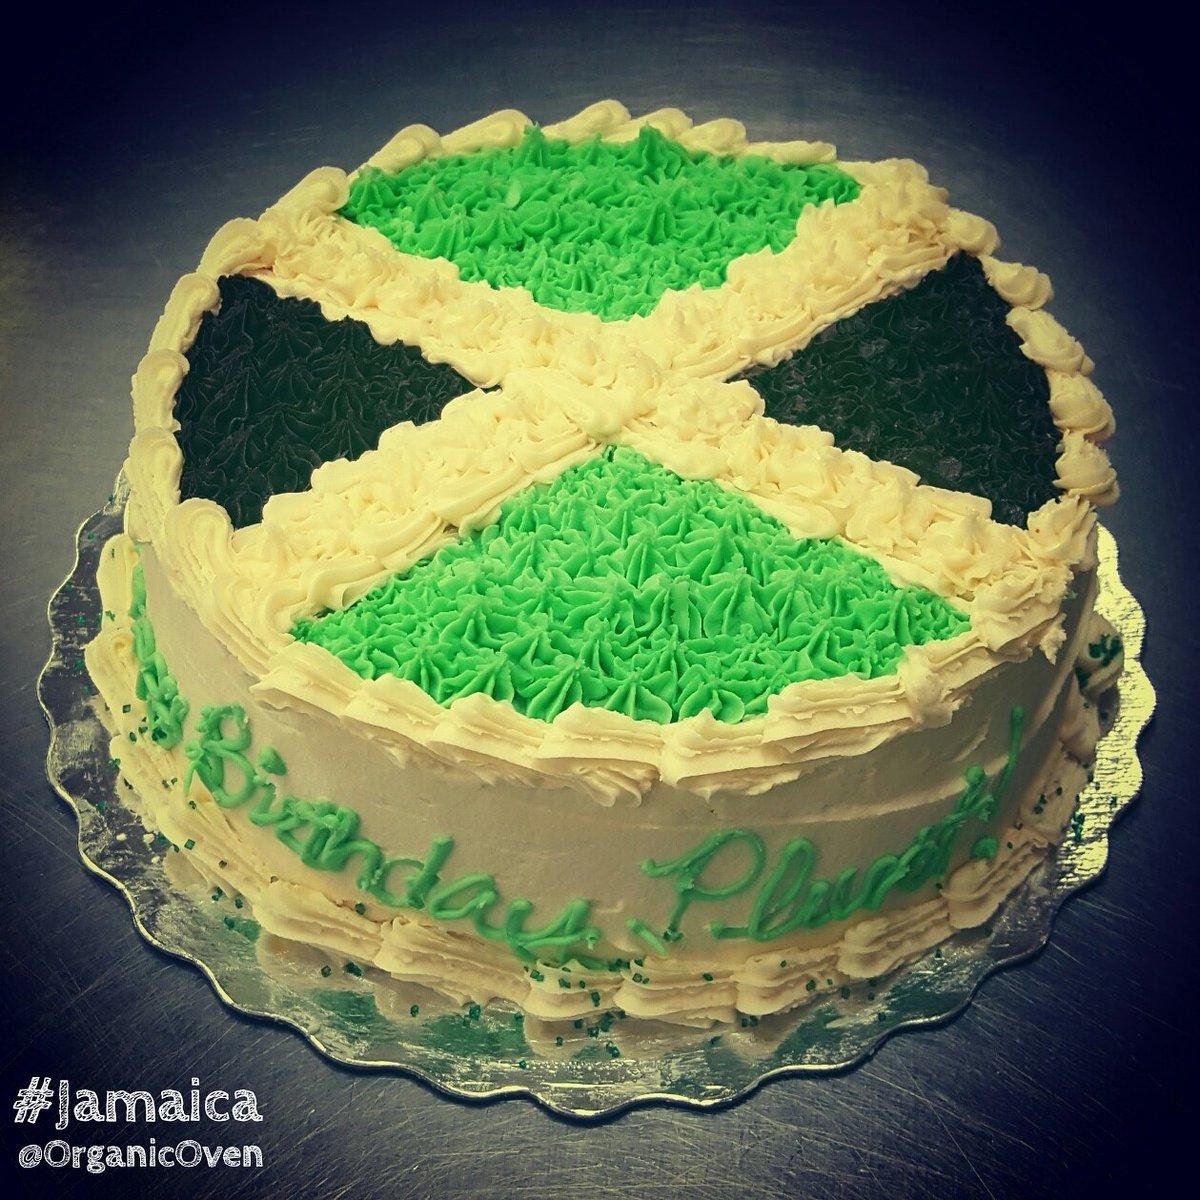 Organic Oven on Twitter Jamaican flag birthday cake GlutenFree